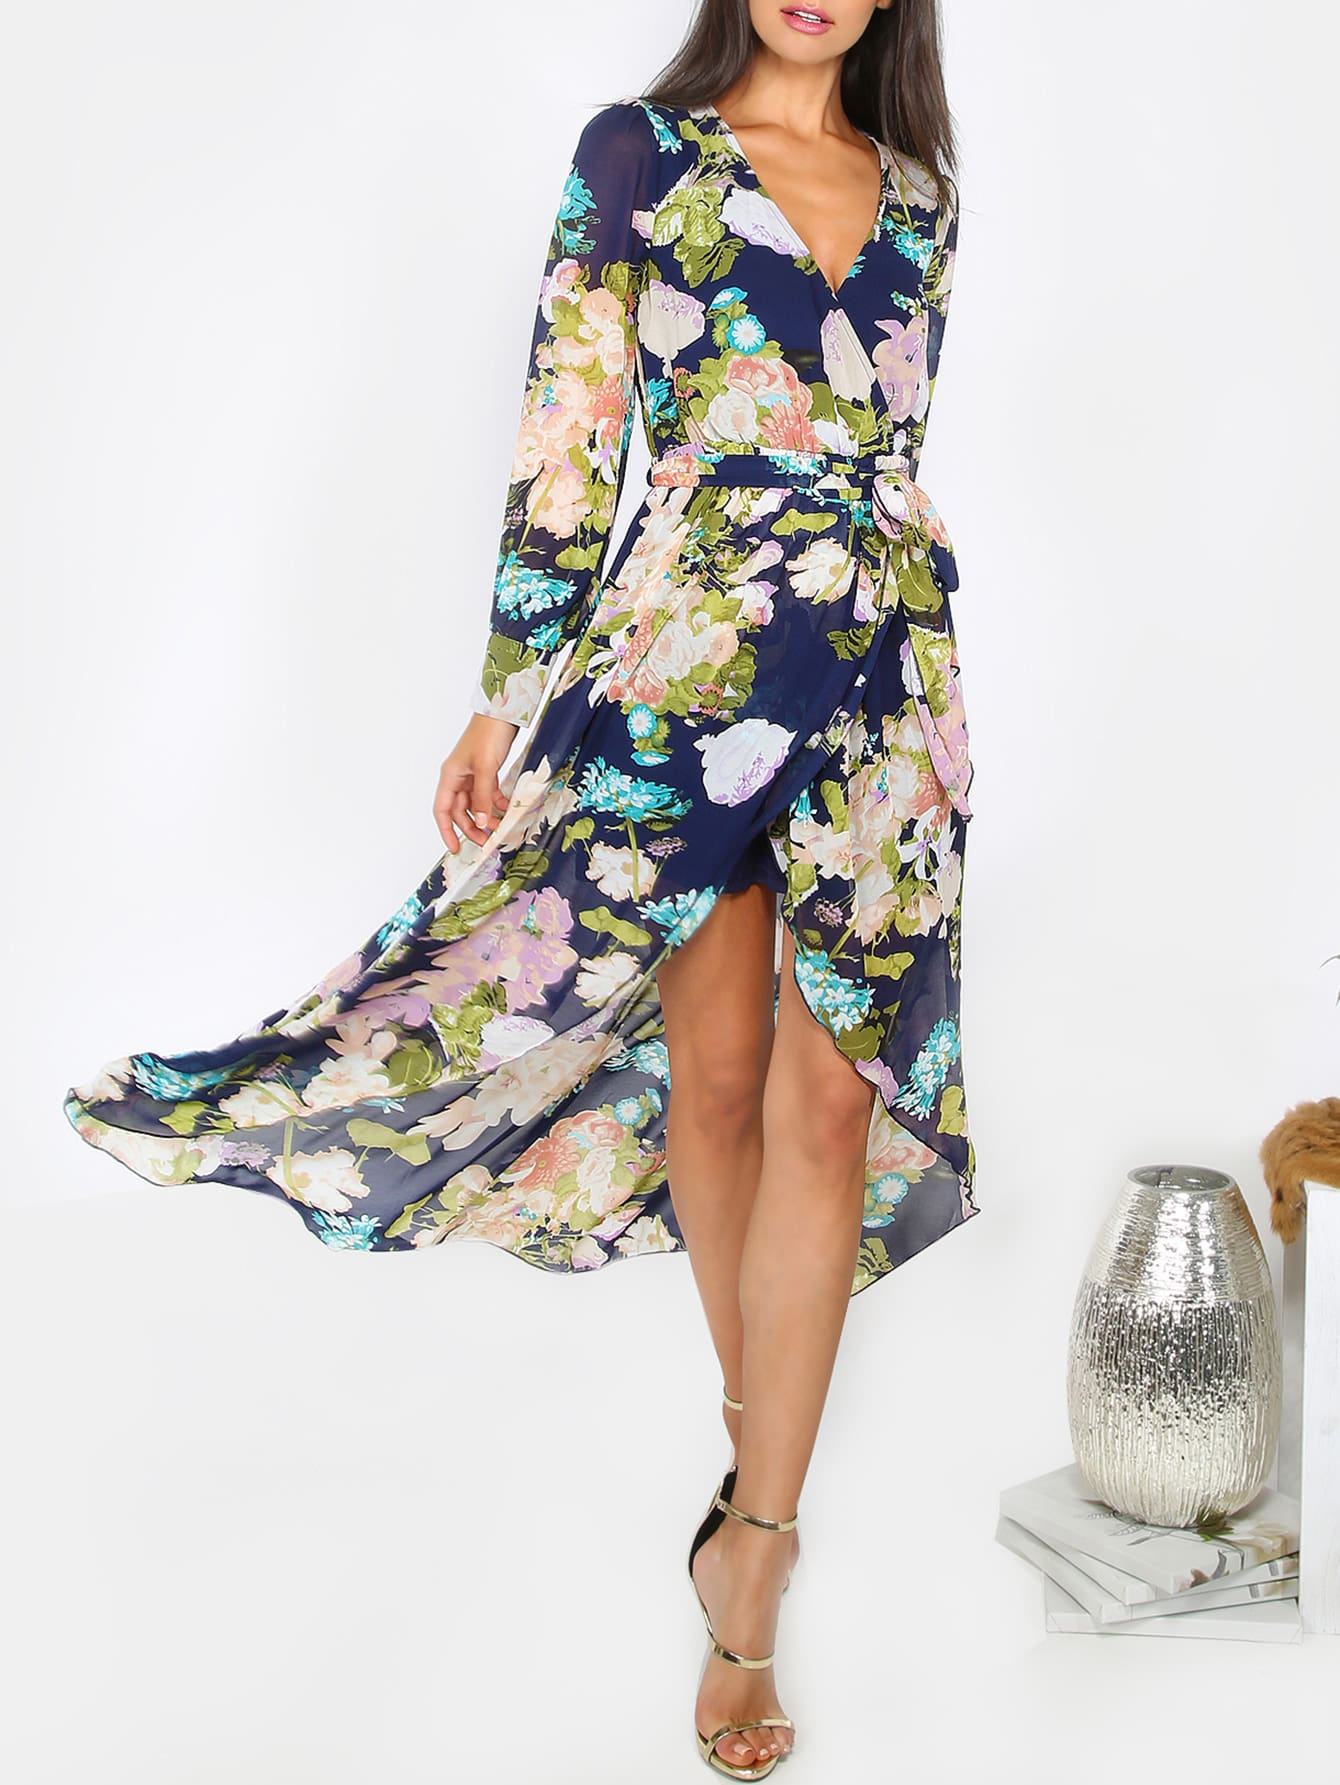 Long Sleeve Open Front Floral Dress NAVYLong Sleeve Open Front Floral Dress NAVY<br><br>color: Navy<br>size: XS